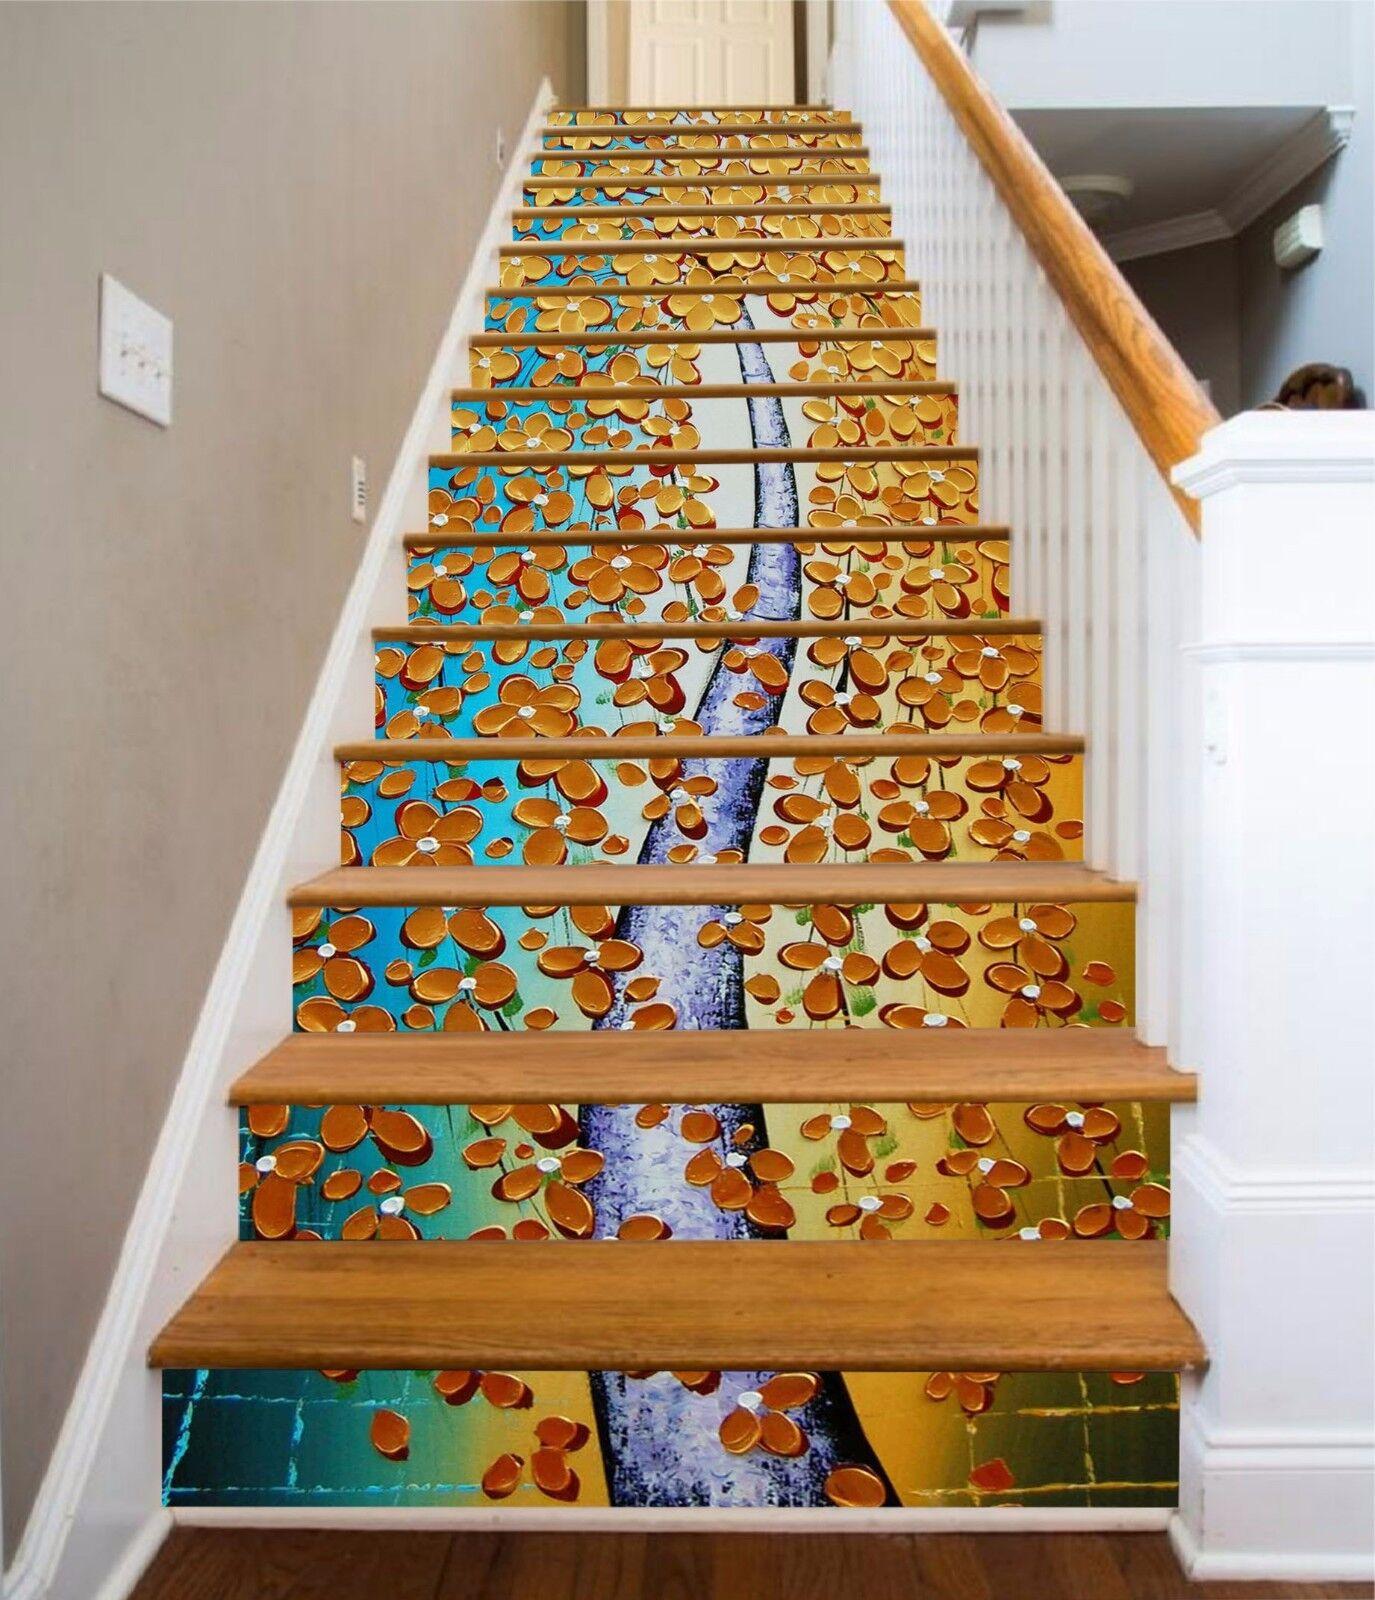 3D Flower Vine 68 Stair Risers Decoration Photo Mural Vinyl Decal Wallpaper UK